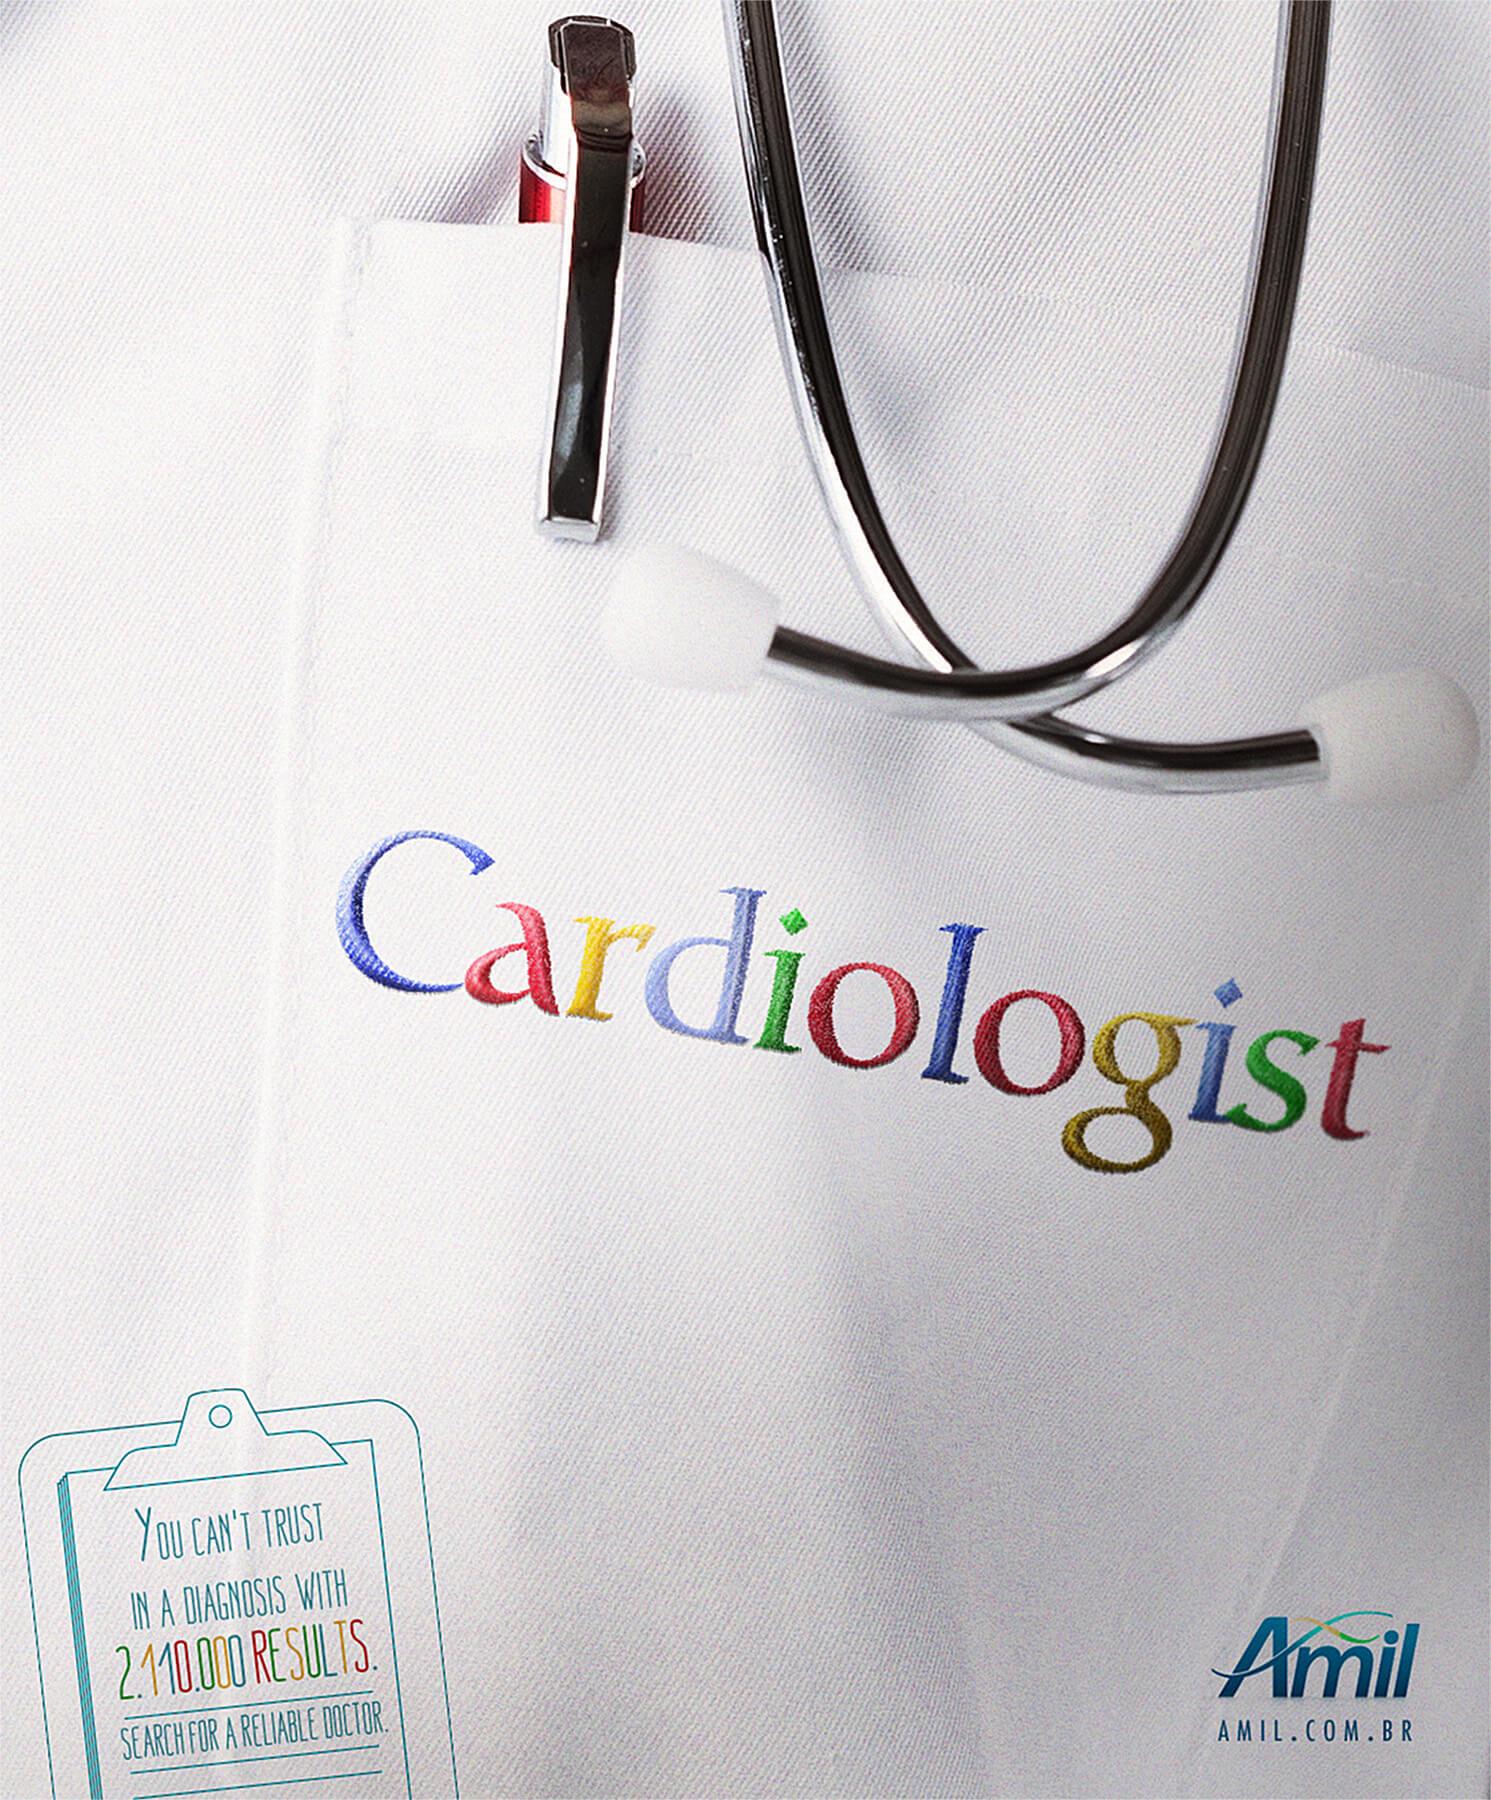 ¿Buscas un diagnóstico acertado?